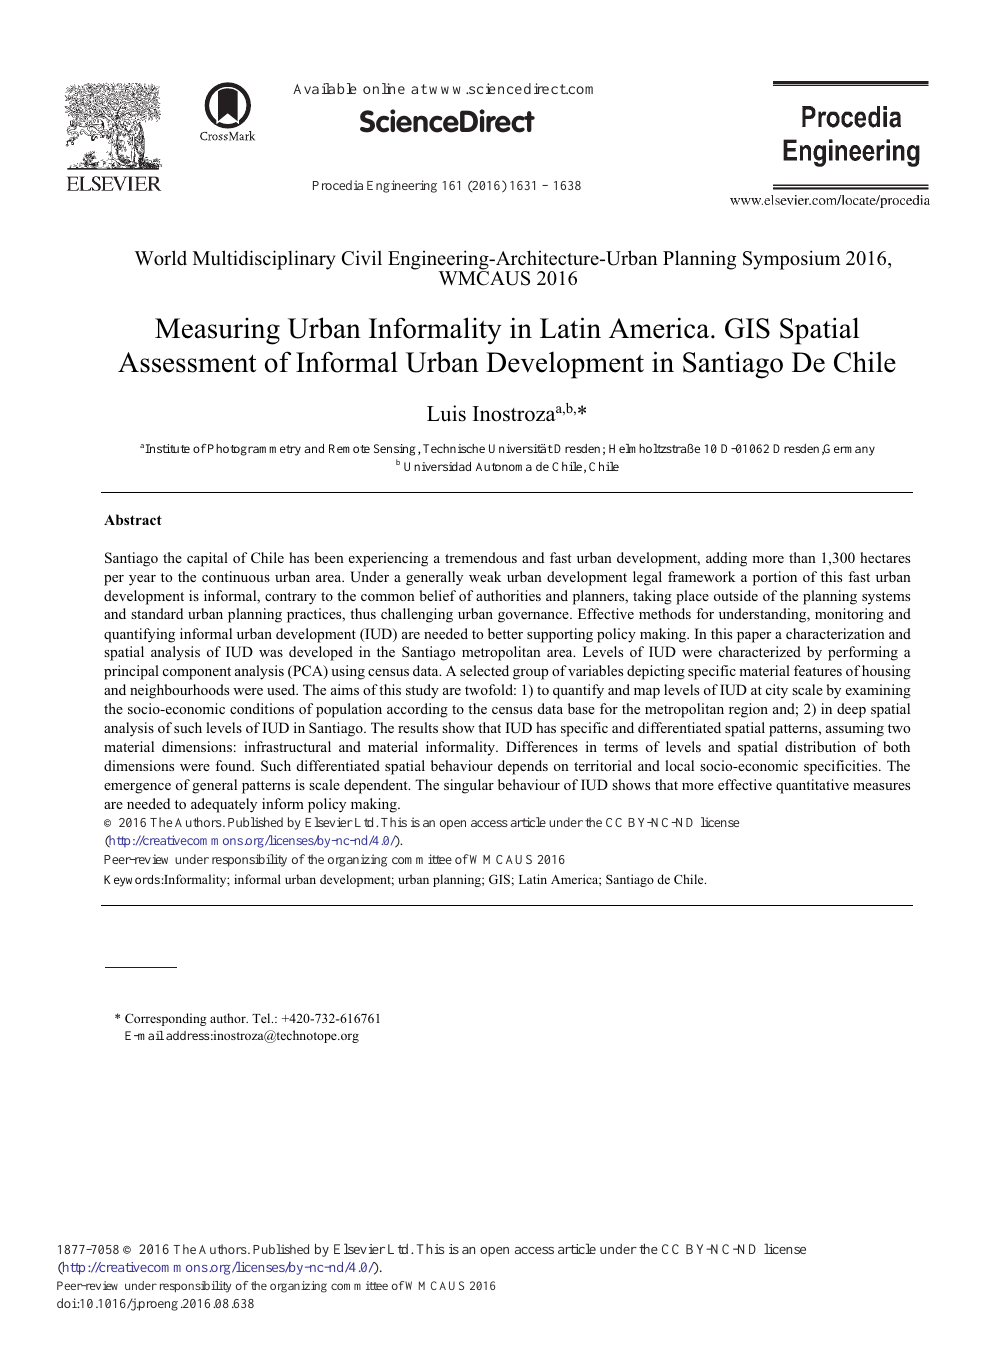 Measuring Urban Informality in Latin America  GIS Spatial